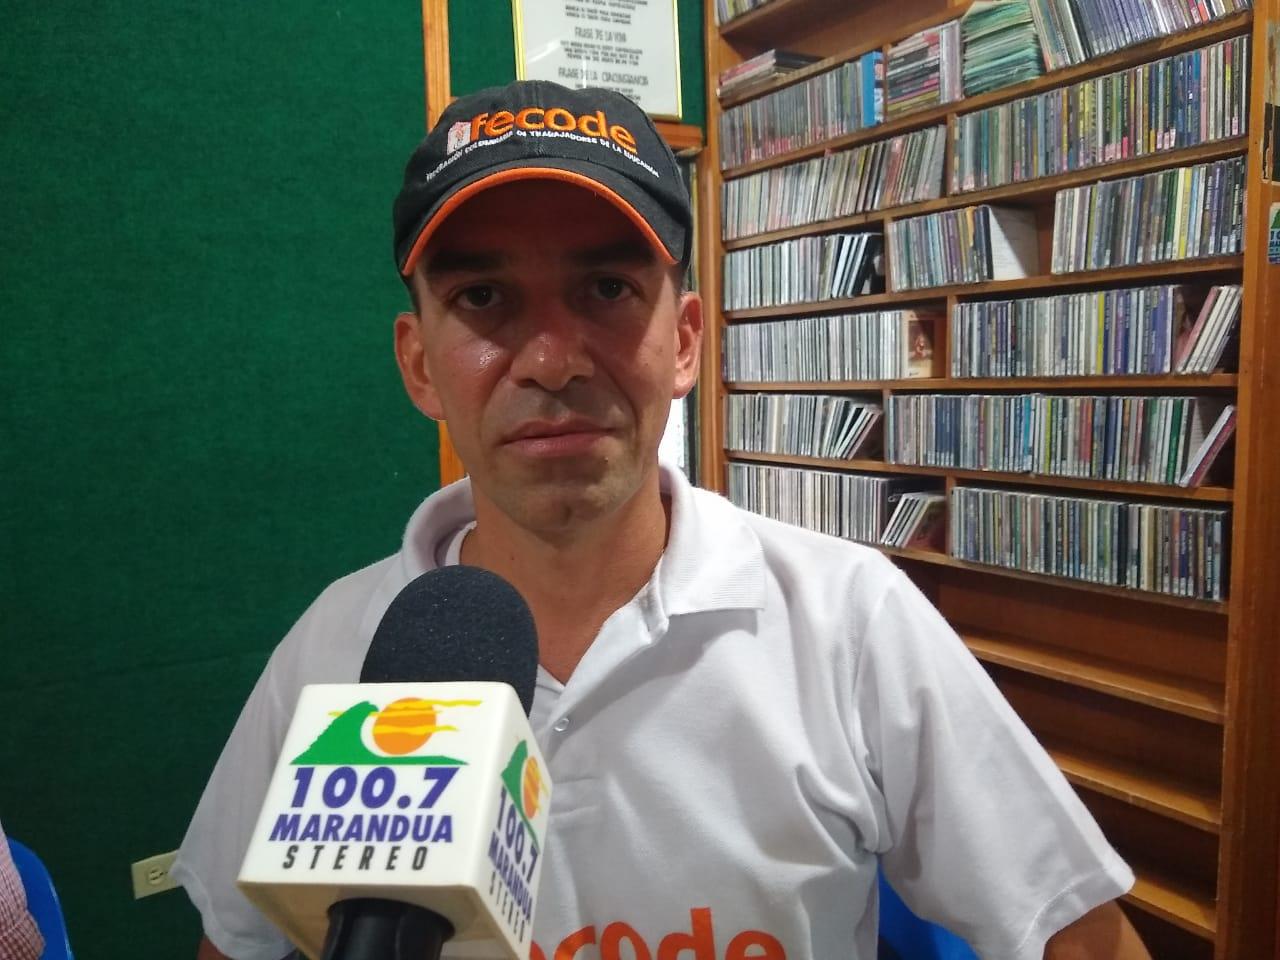 Aurelio Zuluaga, presidente de la Asociación de Educadores del Guaviare (ADEG)